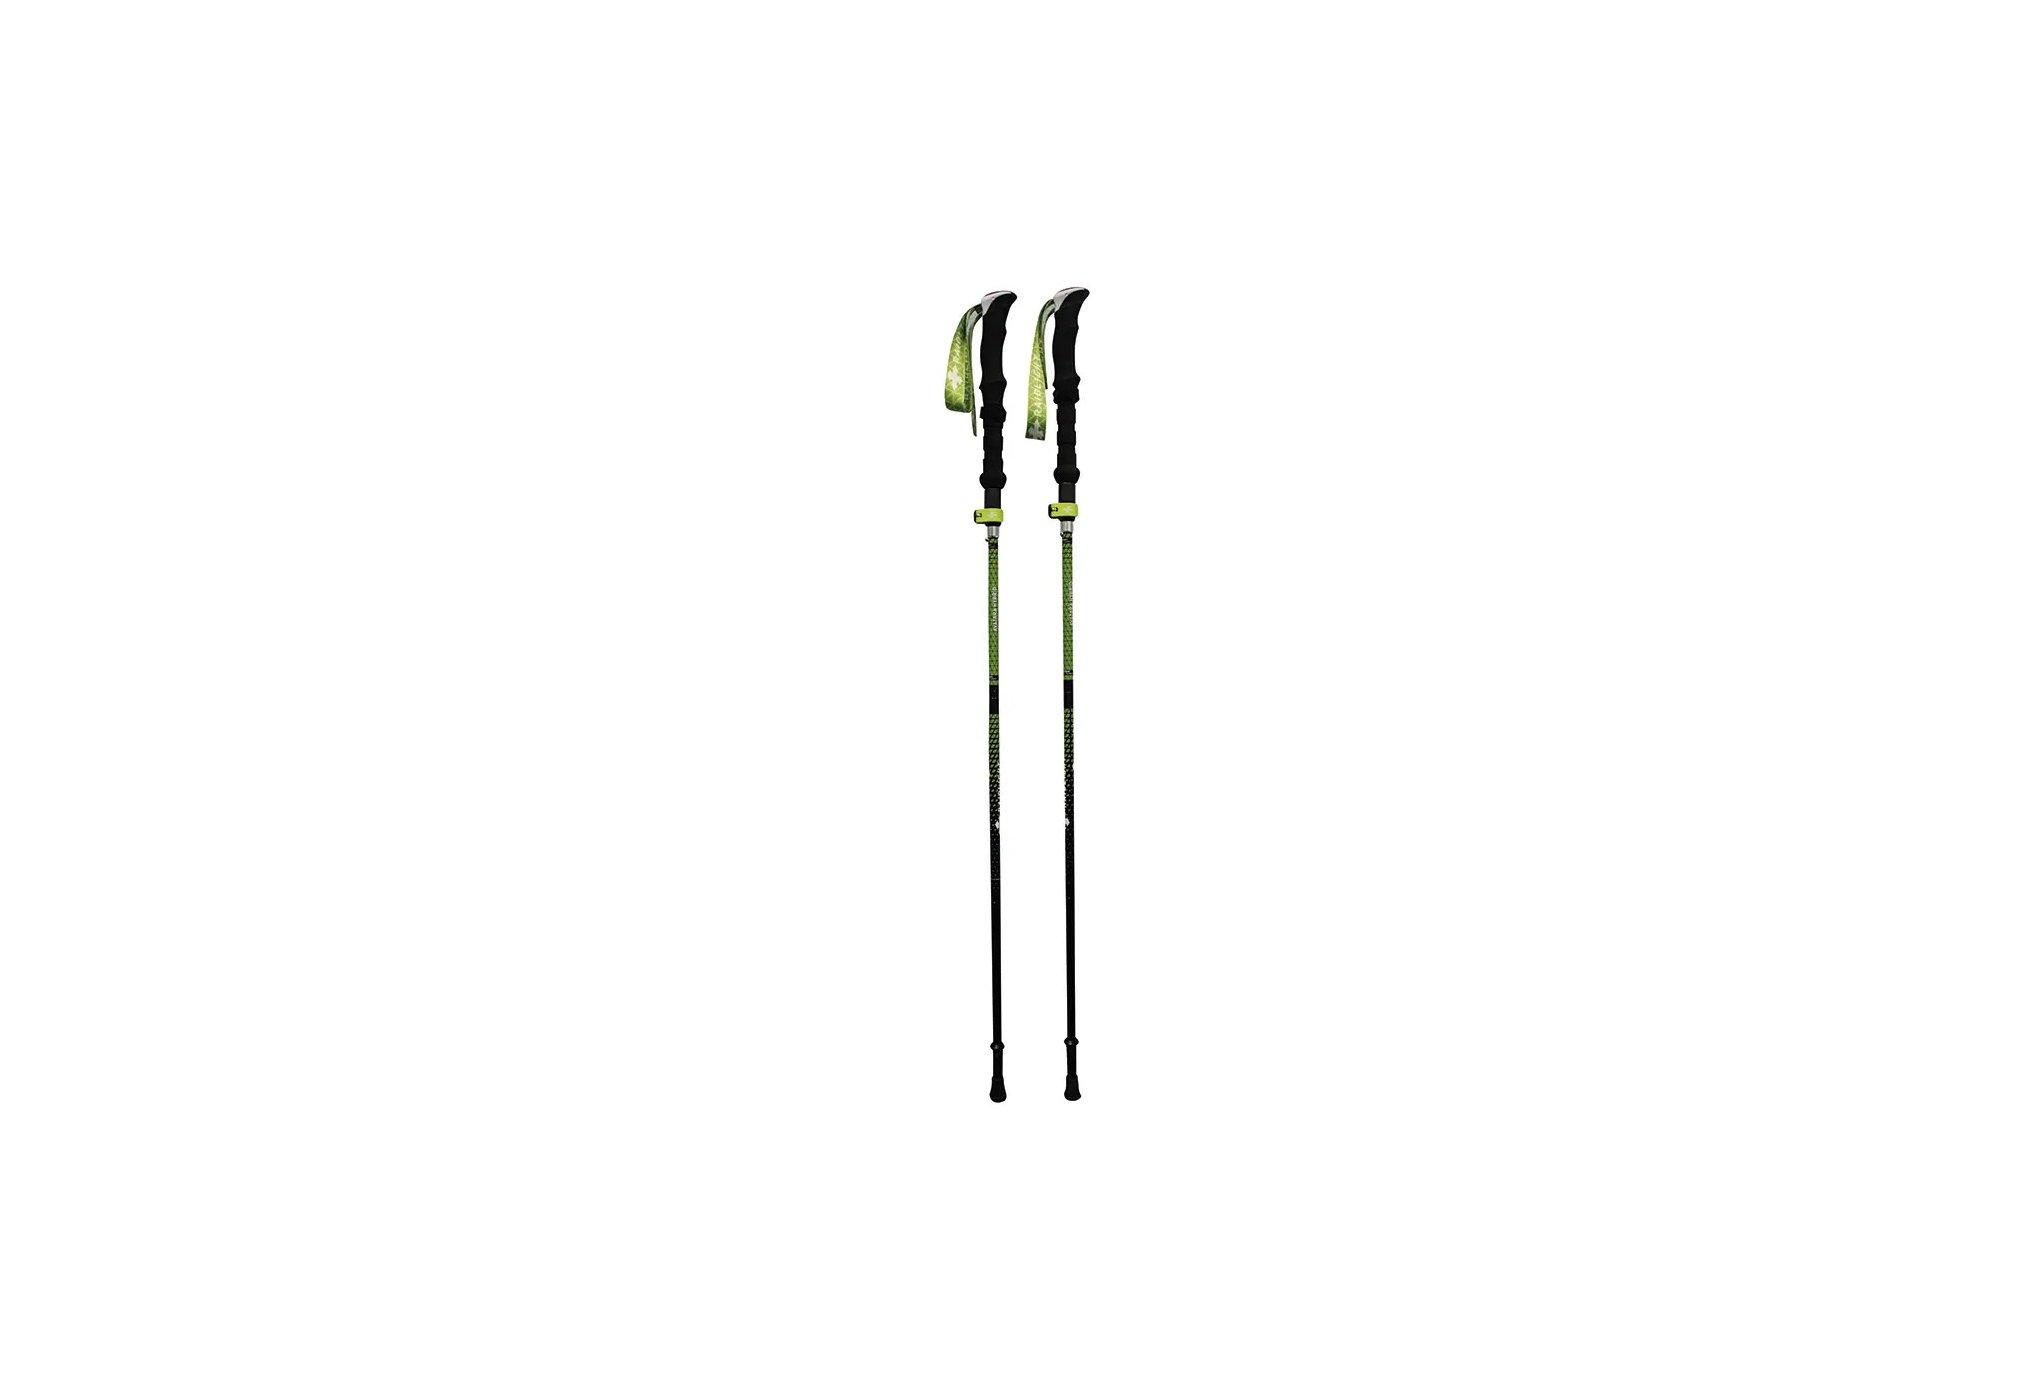 Raidlight Avatara Hybrid Poles Bâtons de marche